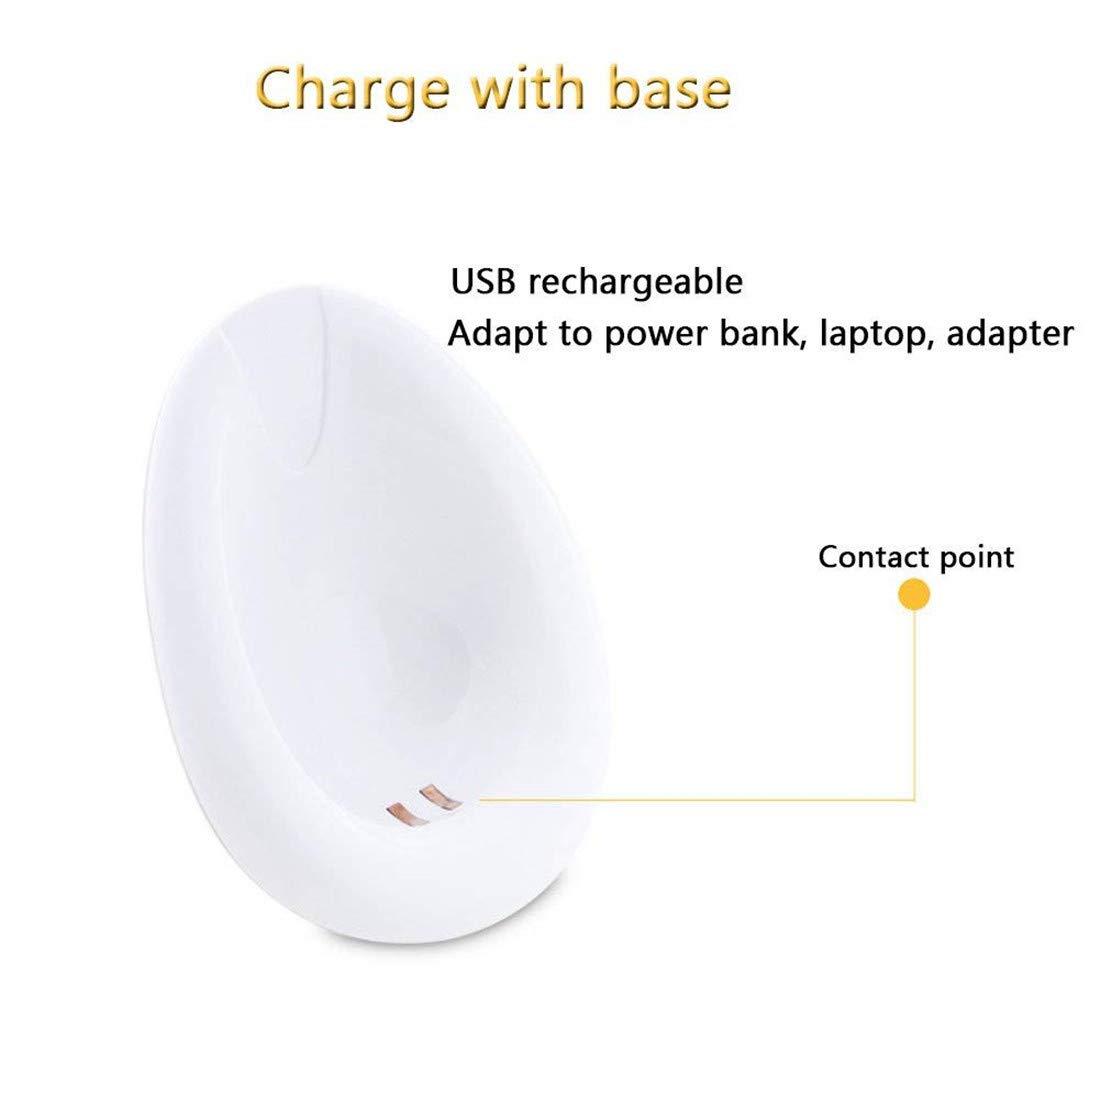 HFOUR Chest Massager/Breast (Carga Enhancer Electric Handheld Para Mujeres/Simulación SPA Vibration Massage (Carga Massager/Breast USB) 0691b6